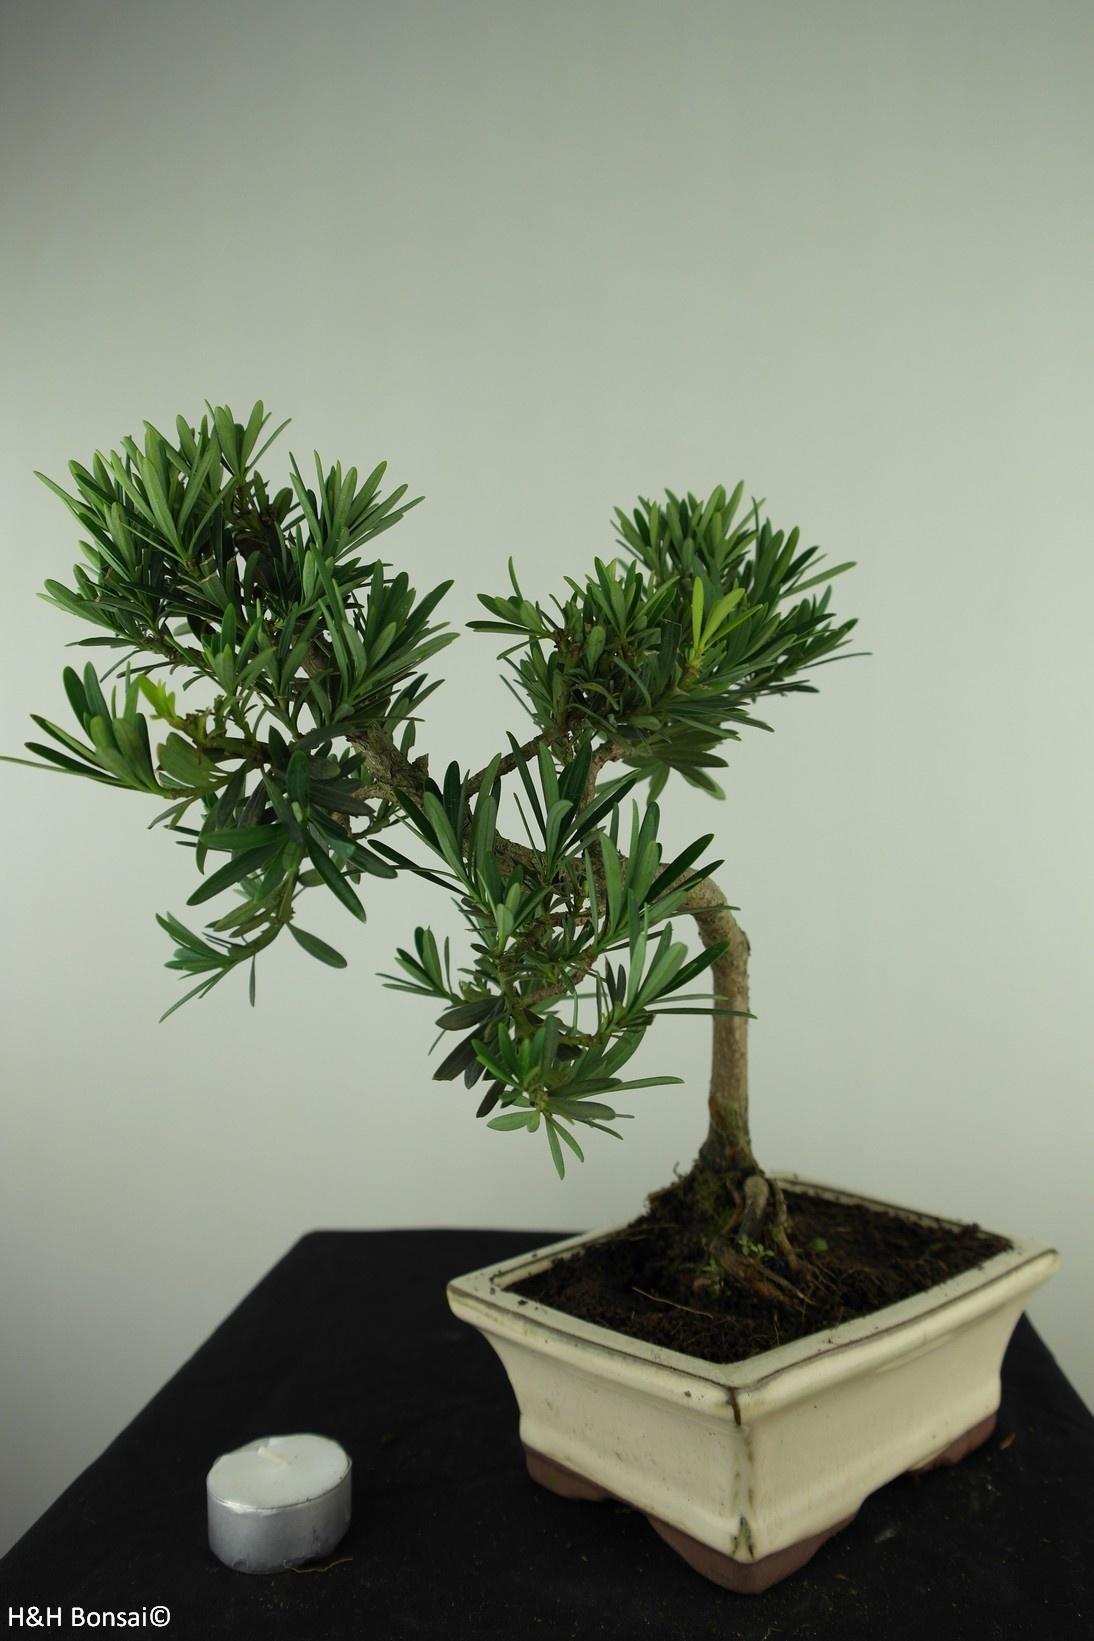 Bonsai Buddhist Pine, Podocarpus, no. 7716